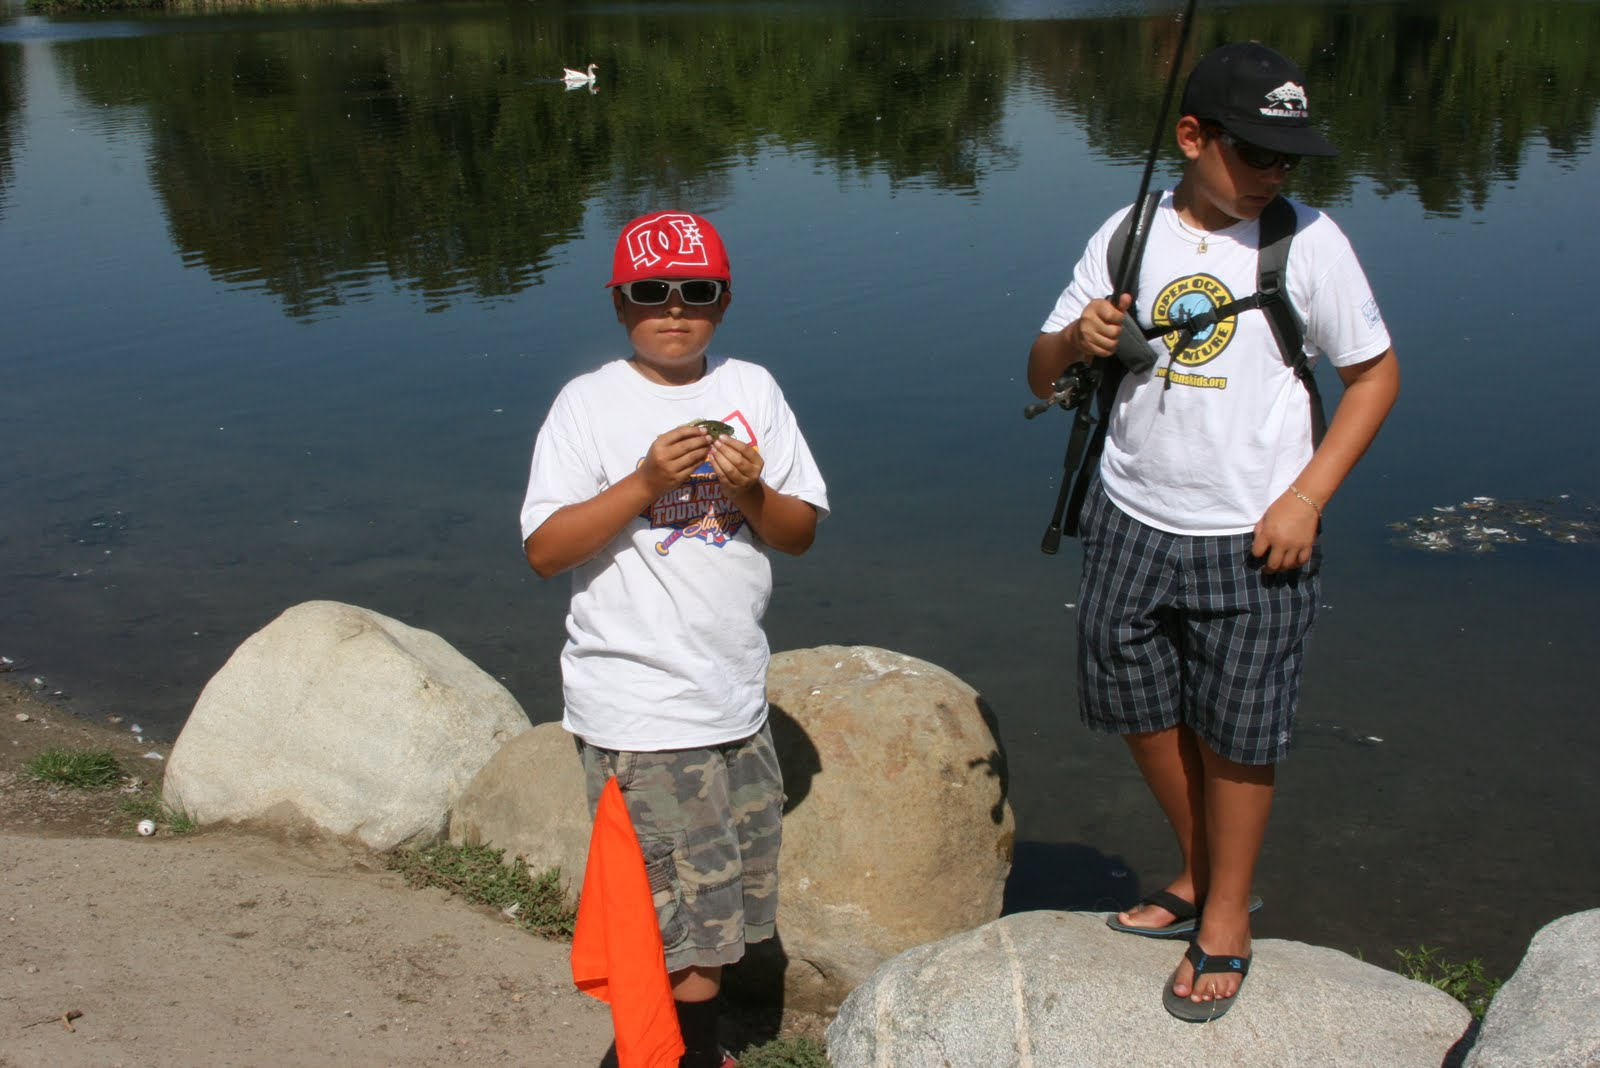 Dan 39 s journal daniel hernandez youth foundation kids for Sport fishing with dan hernandez